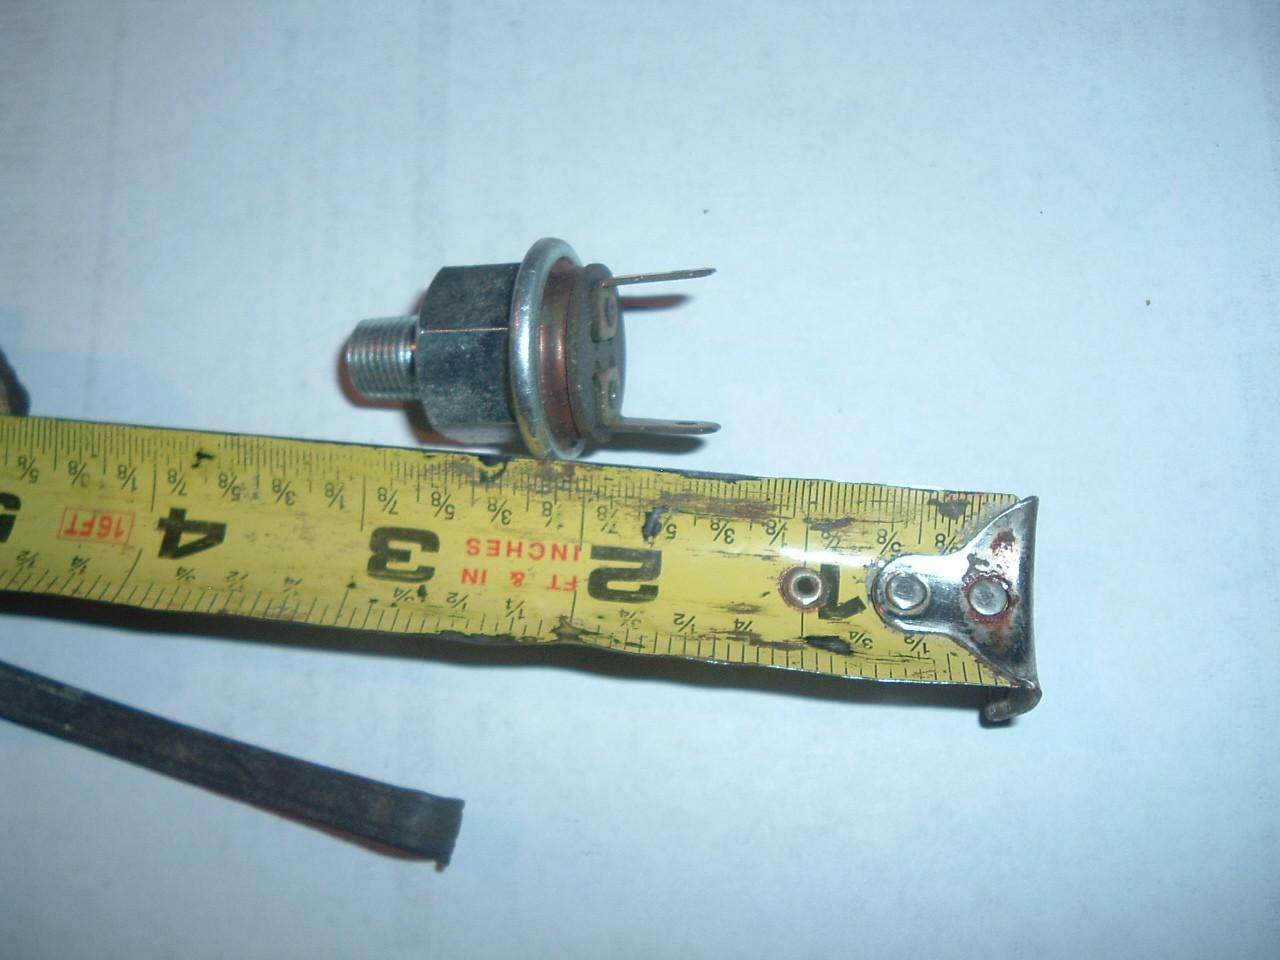 1957 58 59 dodge plymouth desoto chrysler neutral safety switch part # 1770993 (z nsw2)